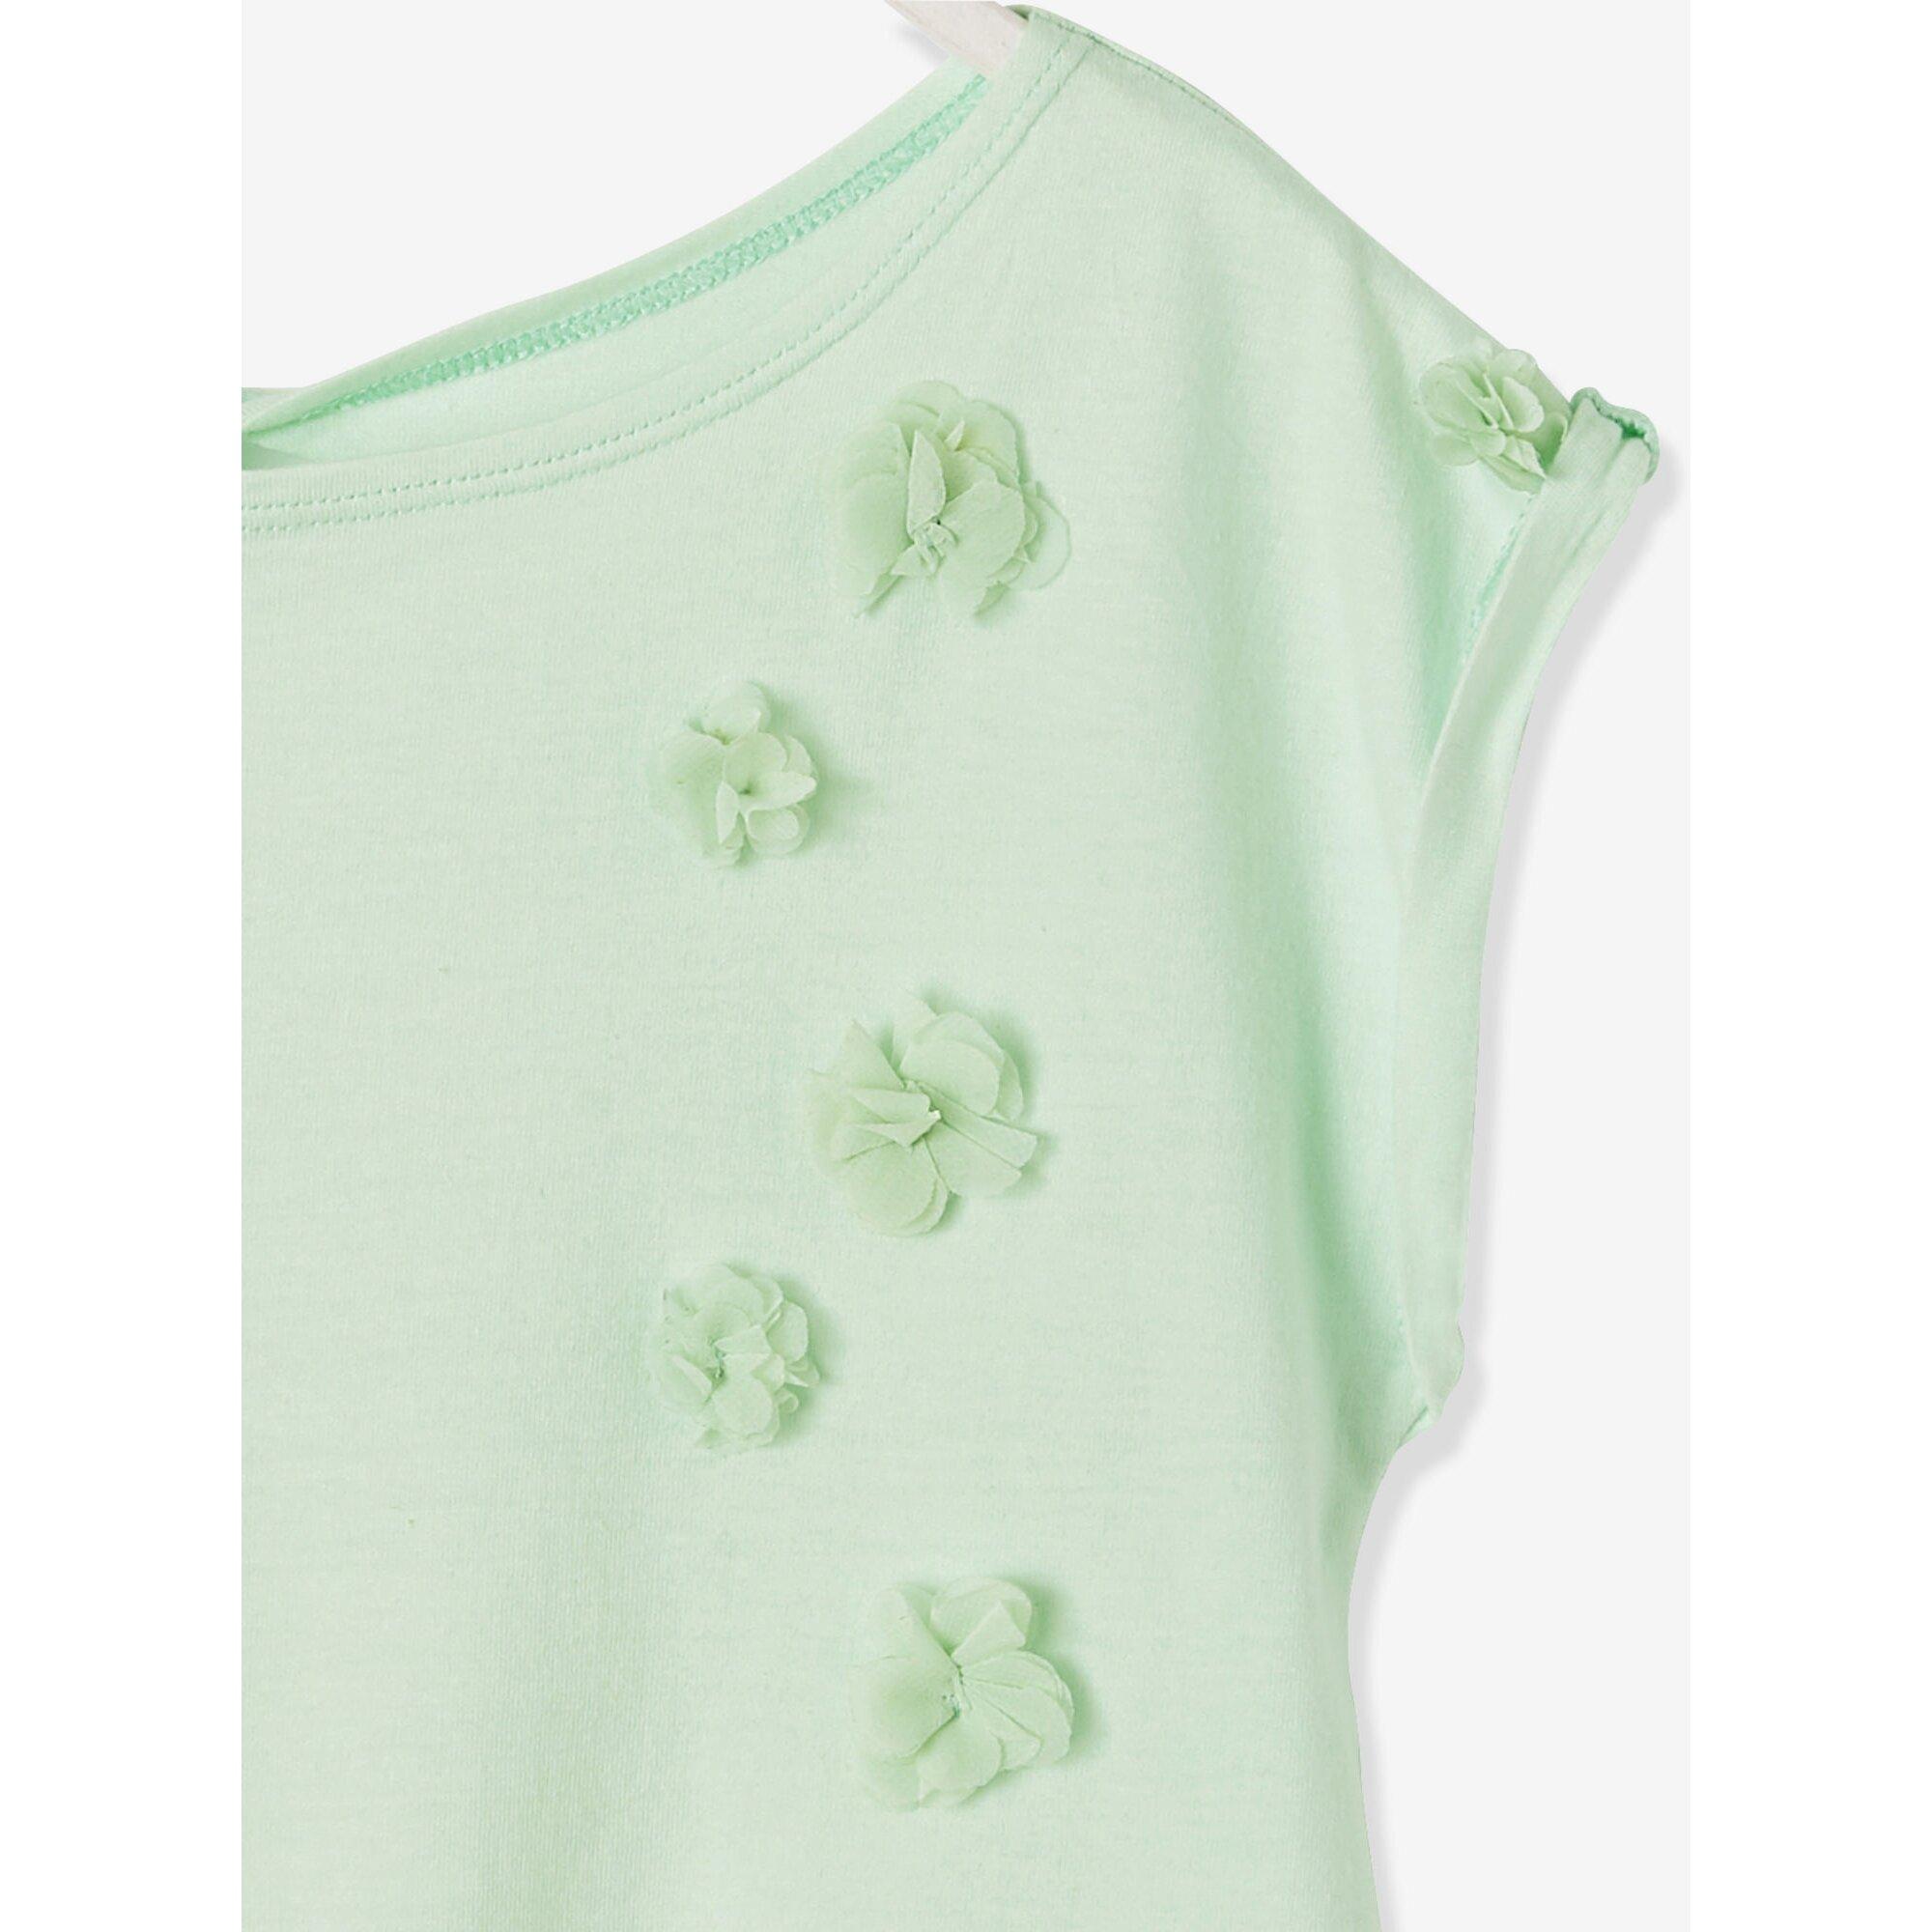 vertbaudet-madchen-t-shirt-blumenapplikation